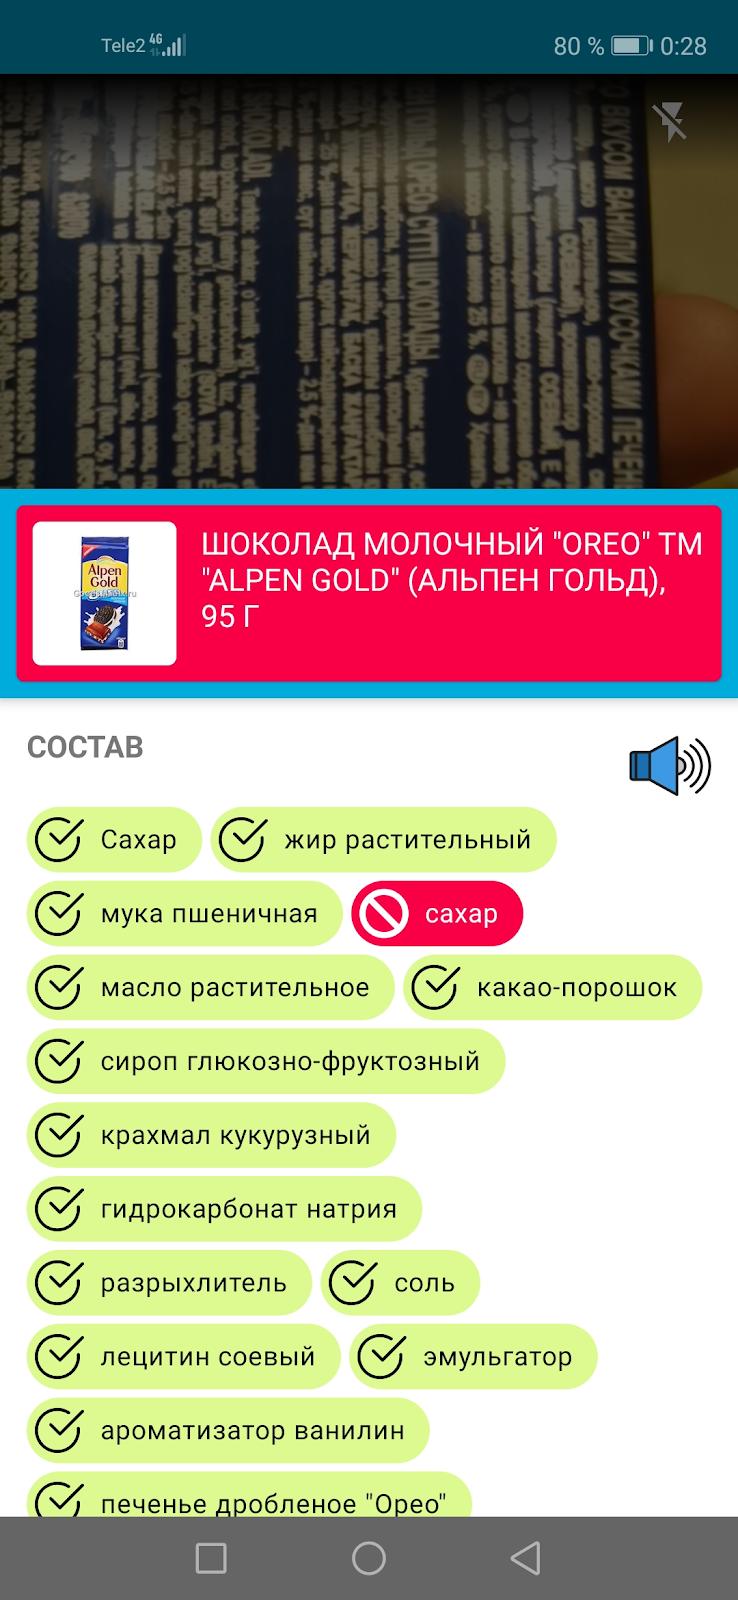 Техновыпуск Mail.ru Group, зима 2019 - 18